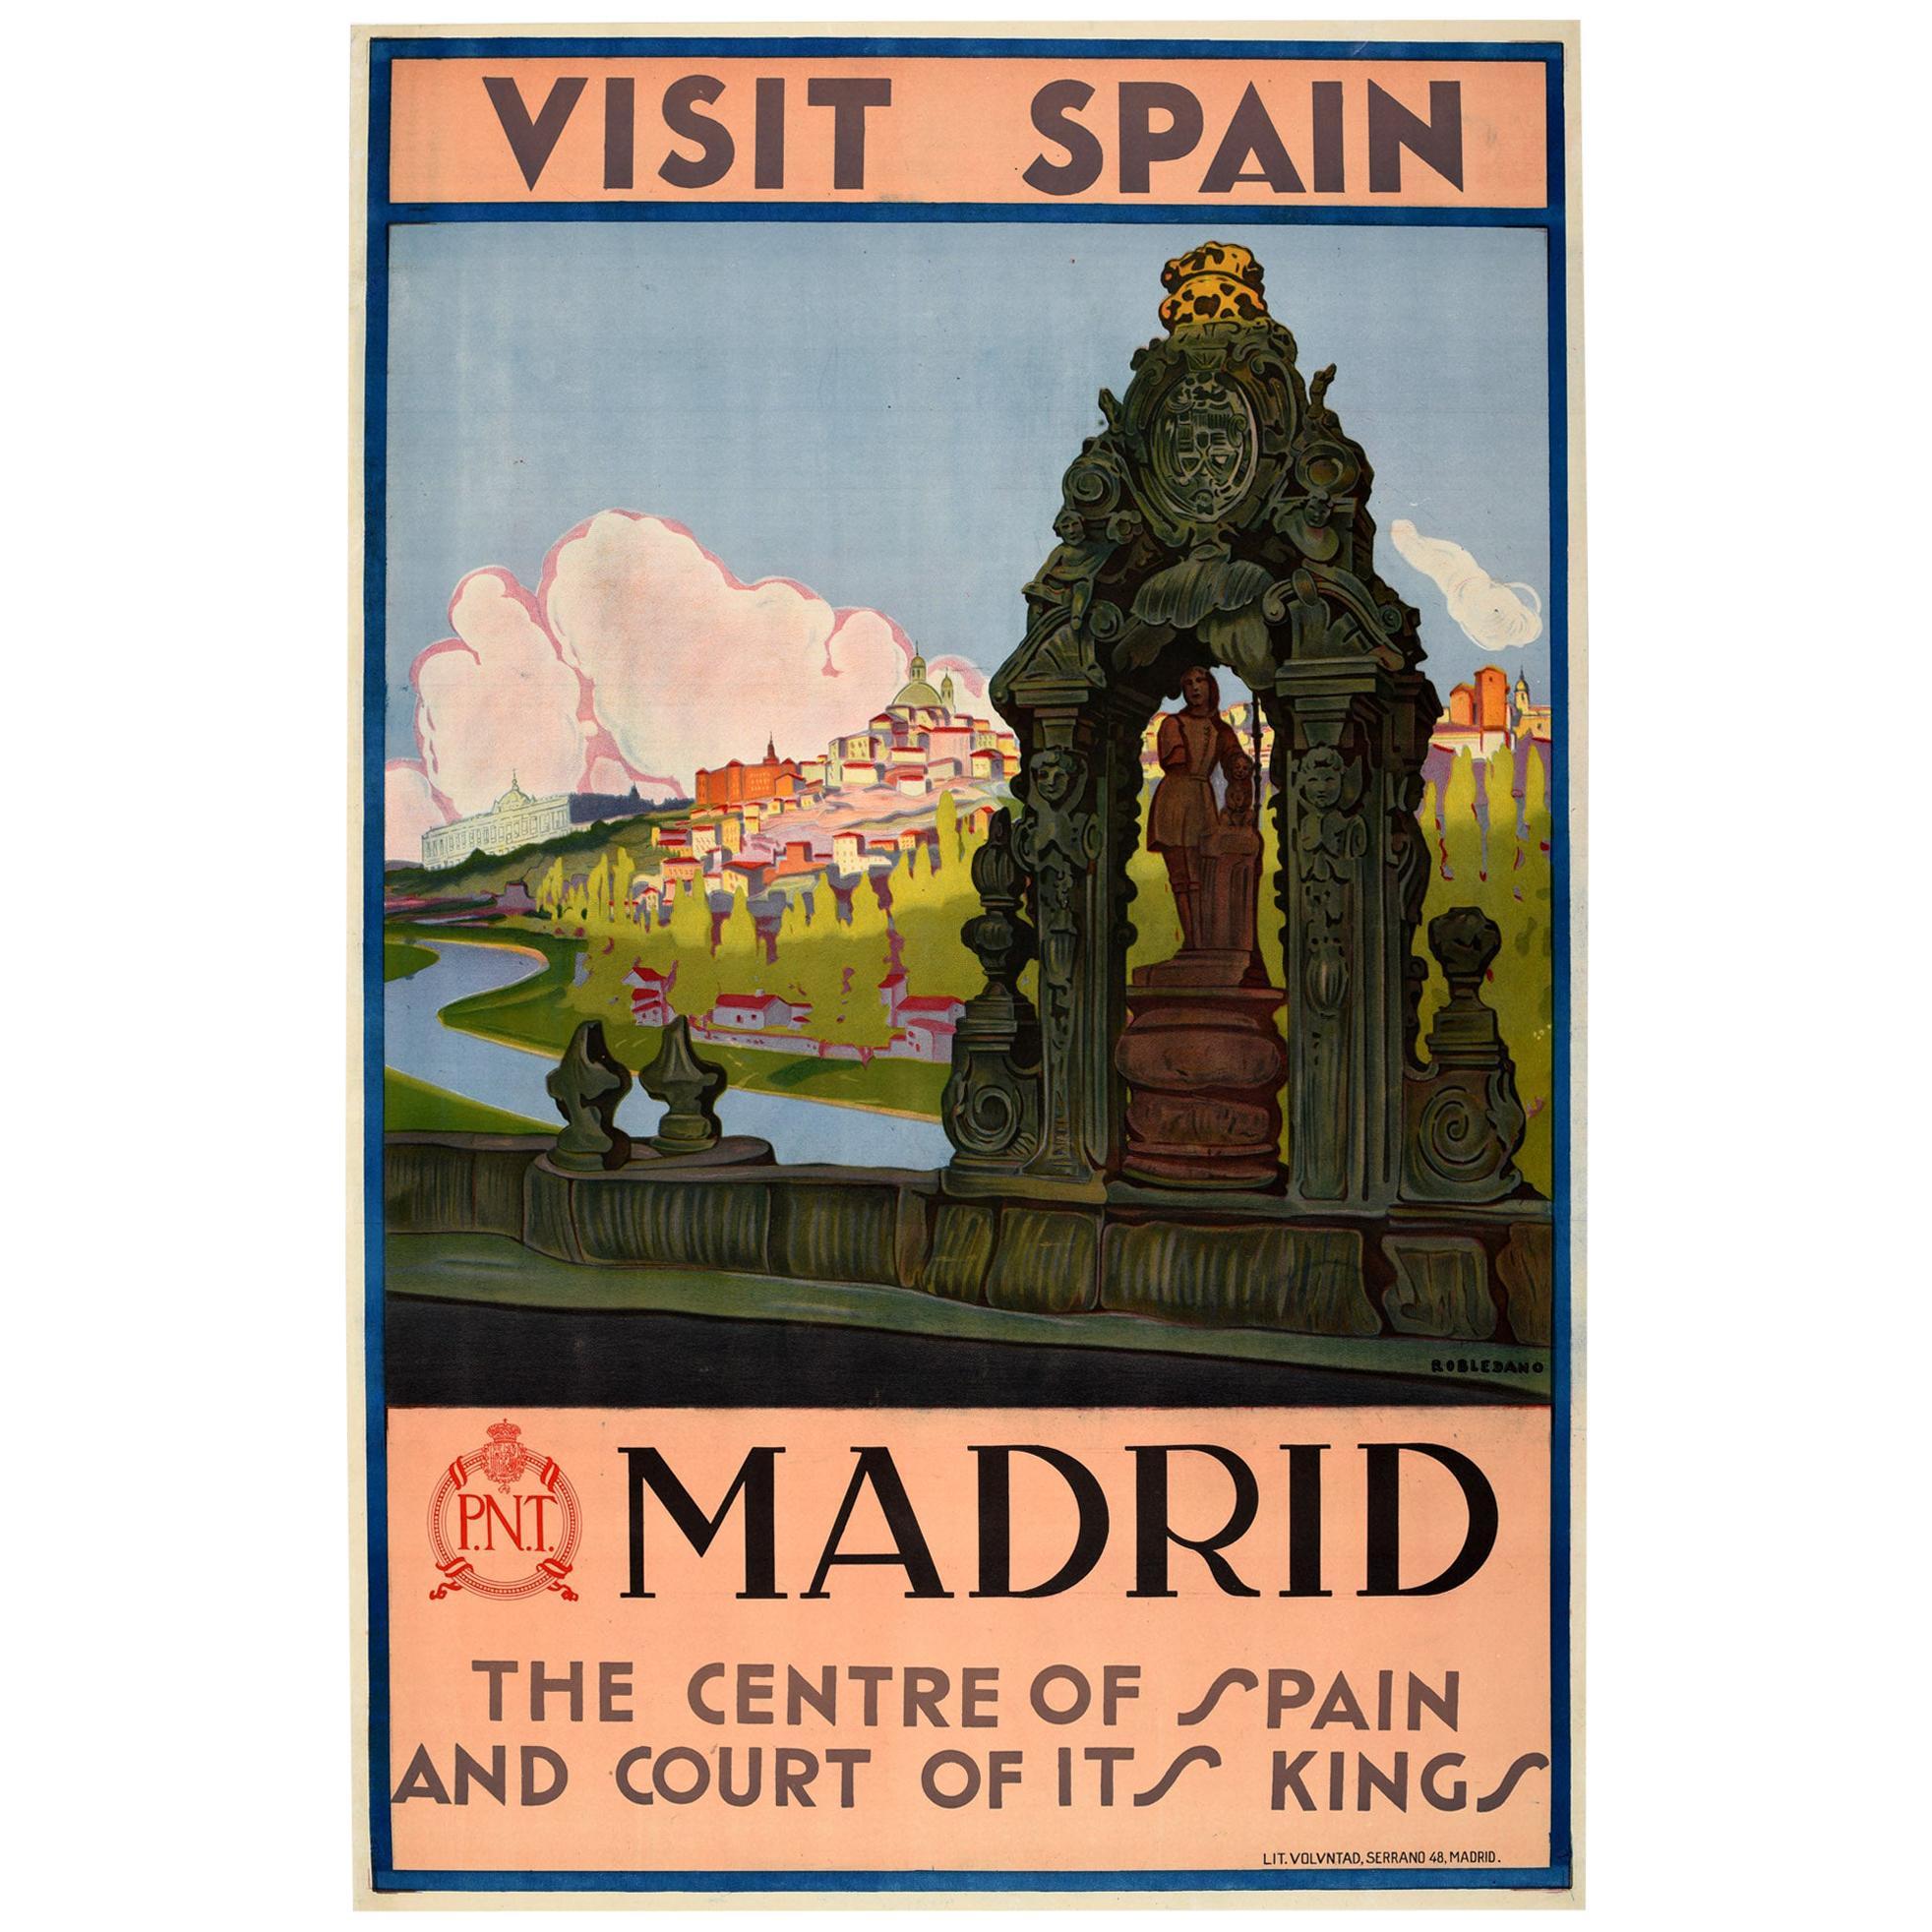 Original Vintage Travel Poster Visit Spain Madrid Court Of Kings Toledo Bridge